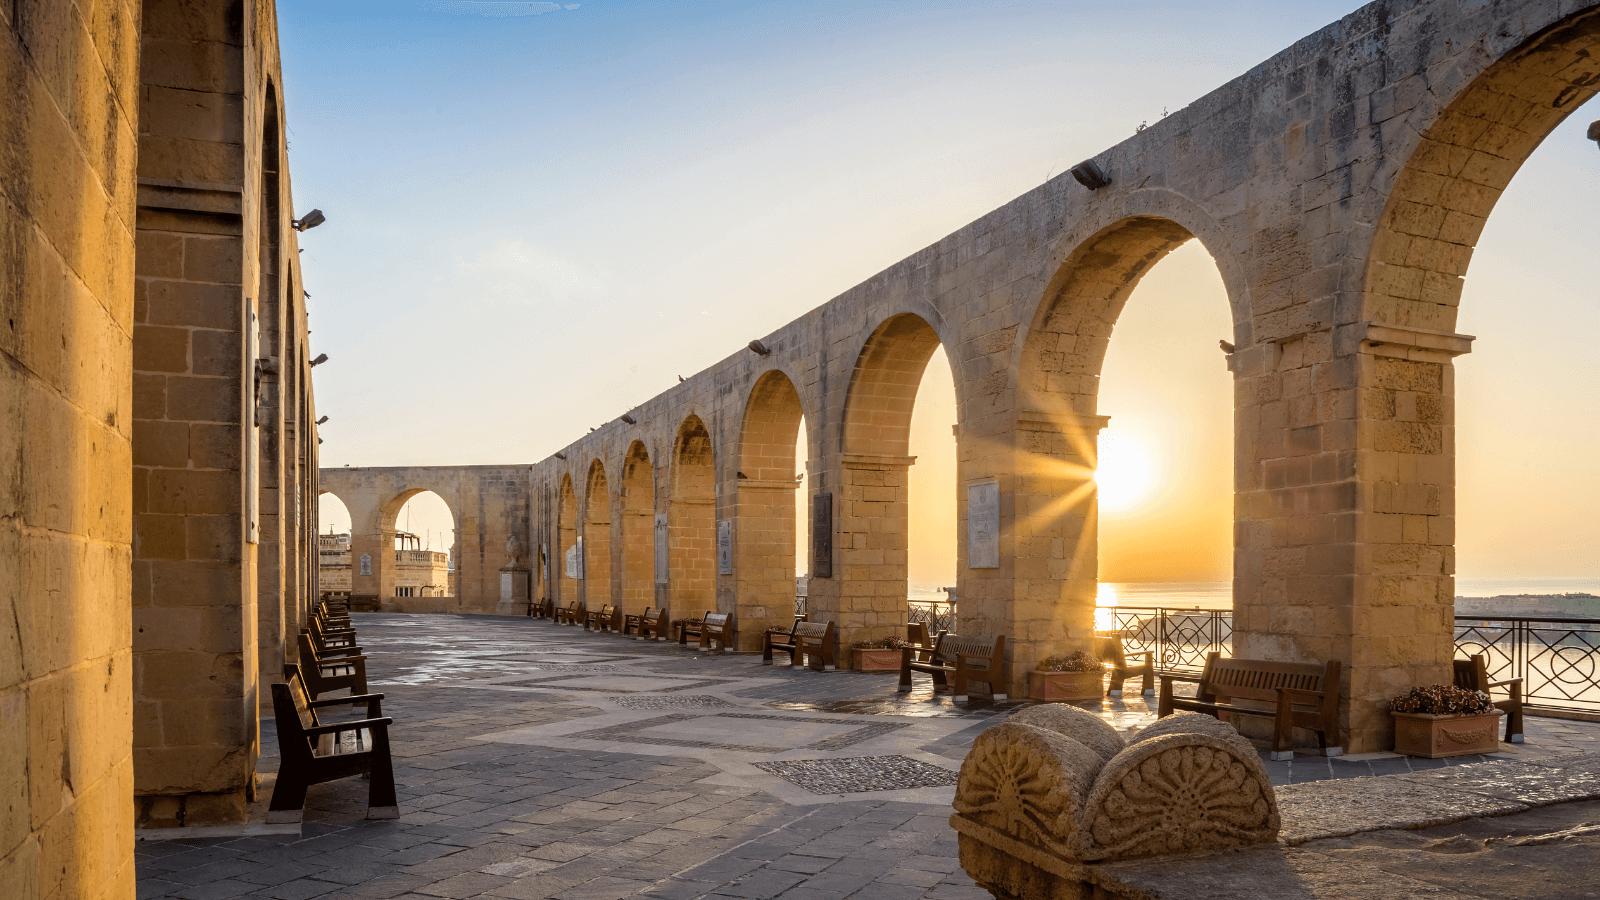 Malta News Briefing – Tuesday 22 June 2021